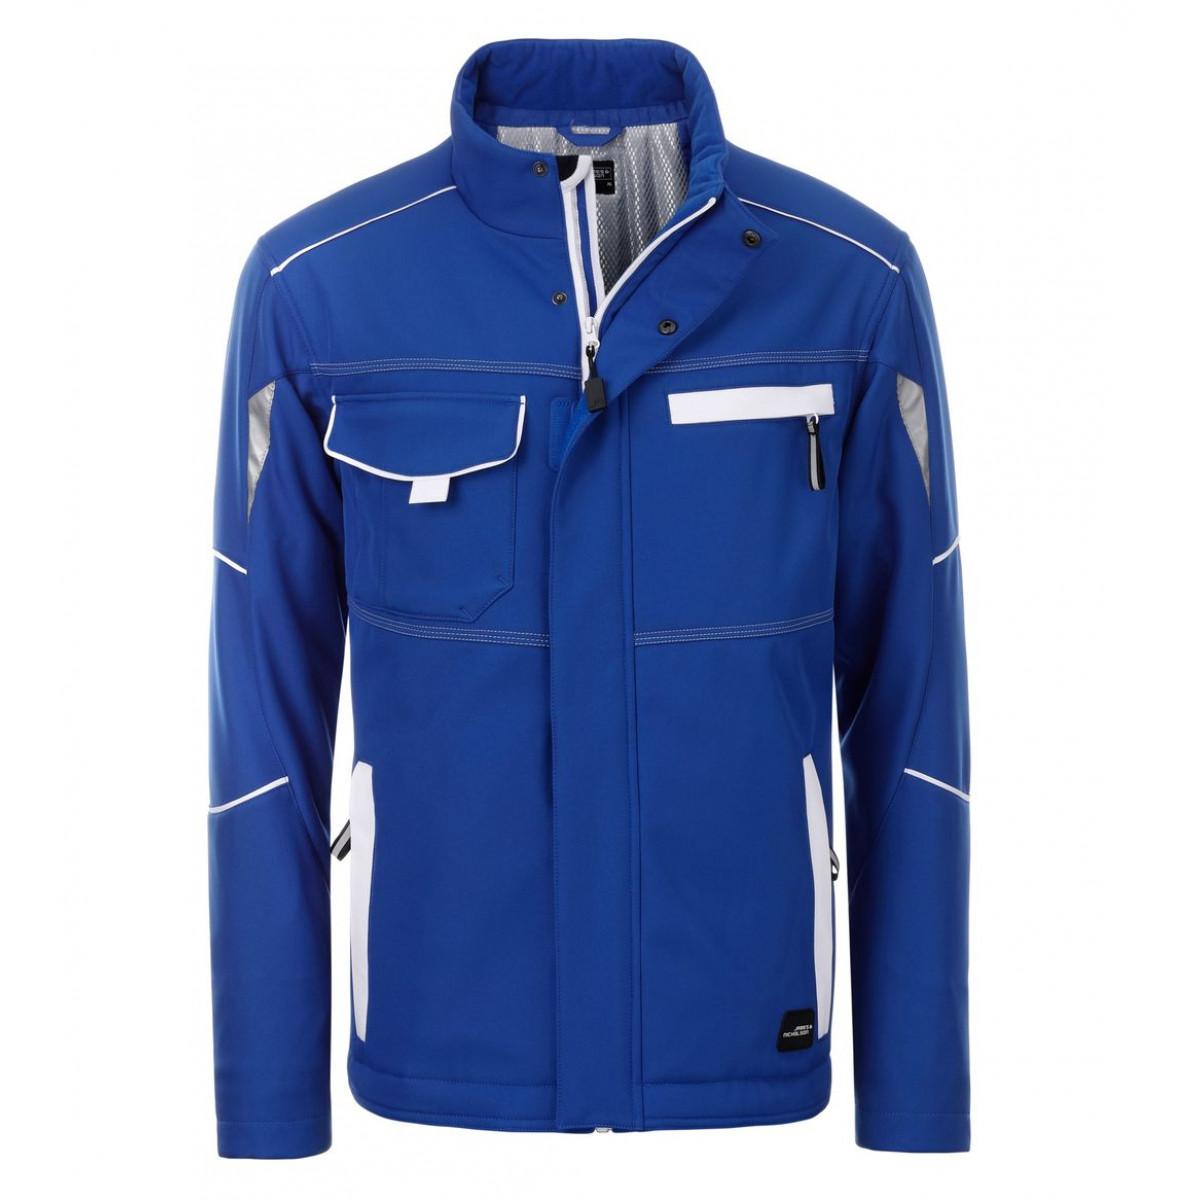 Куртка мужская JN853 Workwear Softshell Padded Jacket-Level 2 - Ярко-синий/Белый